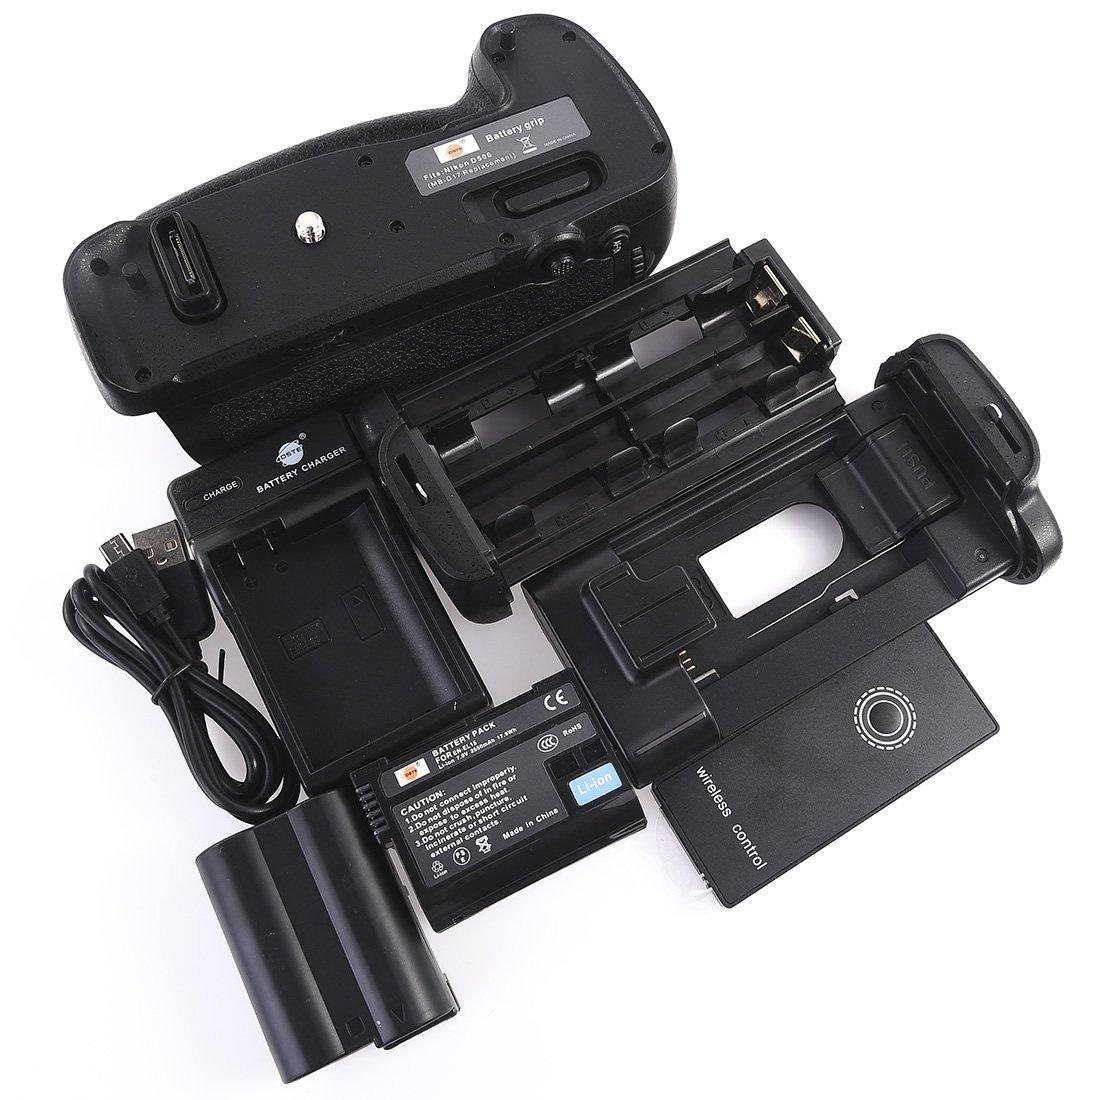 DSTE MB-D17 Battery Grip with Remote Control + 2x EN-EL15 Battery + USB Charger for Nikon D500